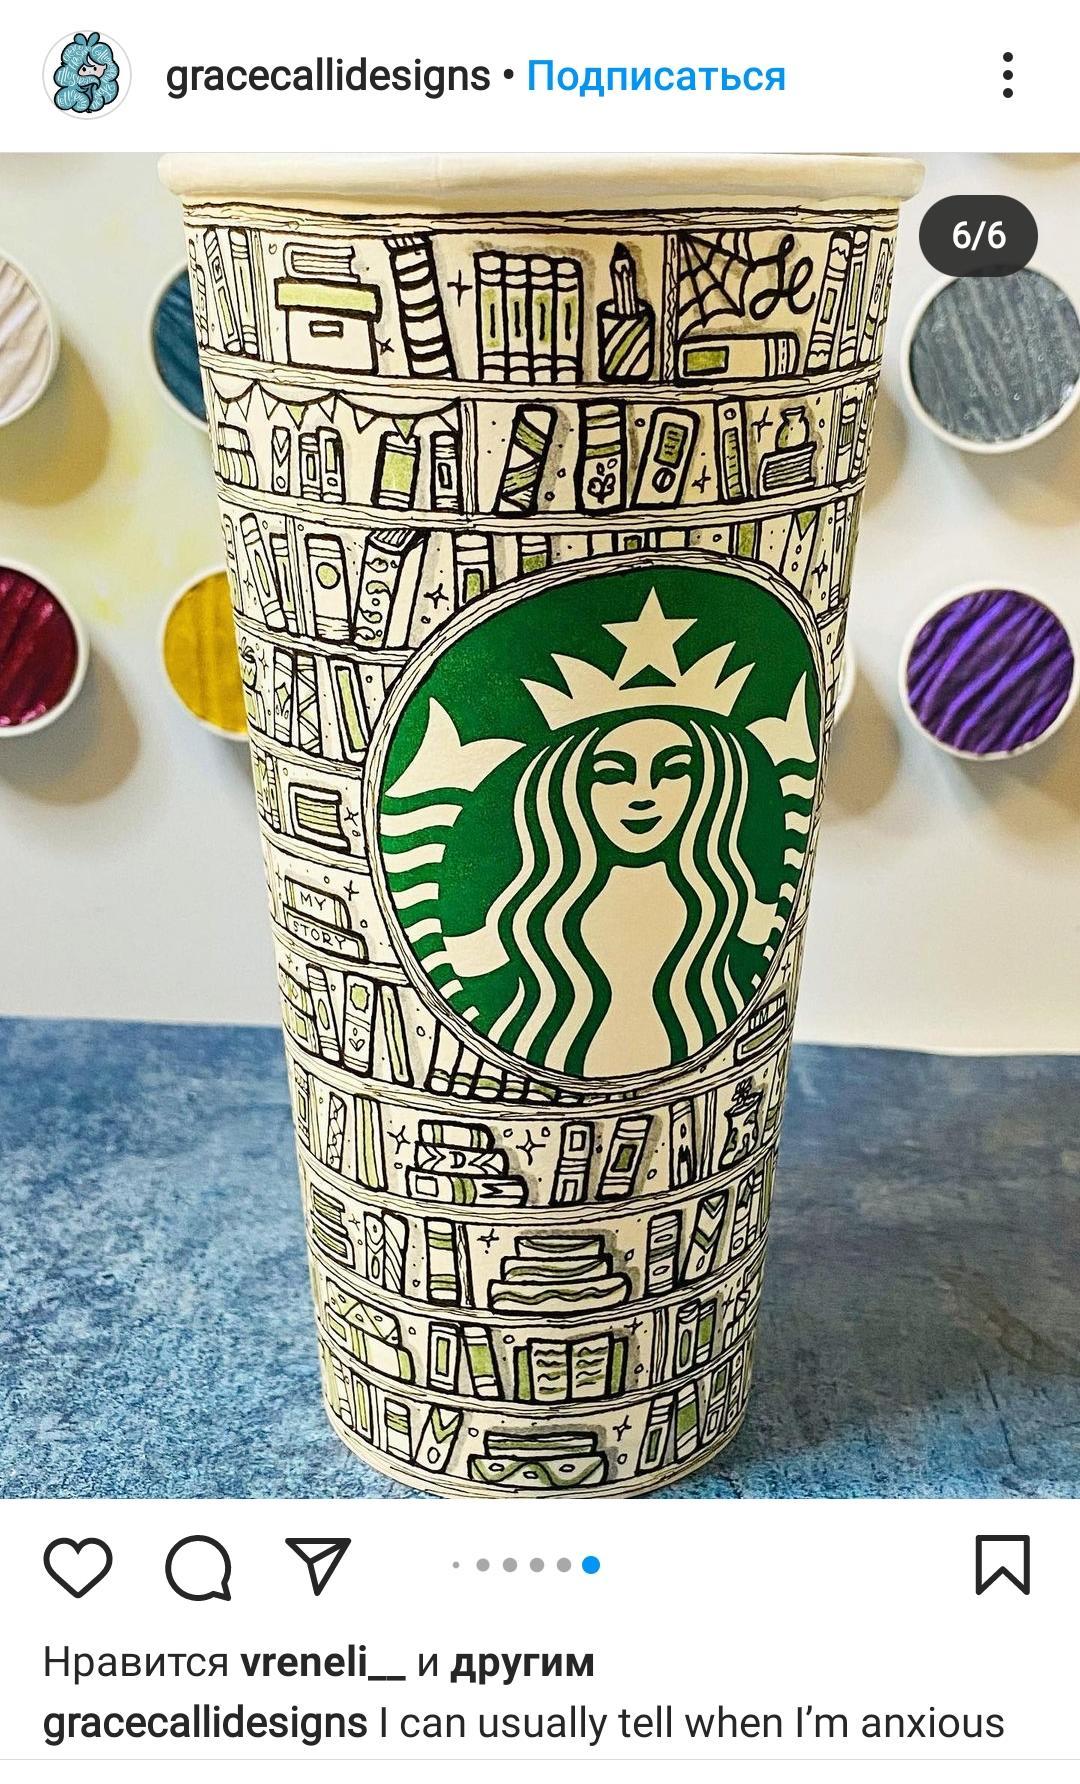 Пример UGC-активации от Starbucks